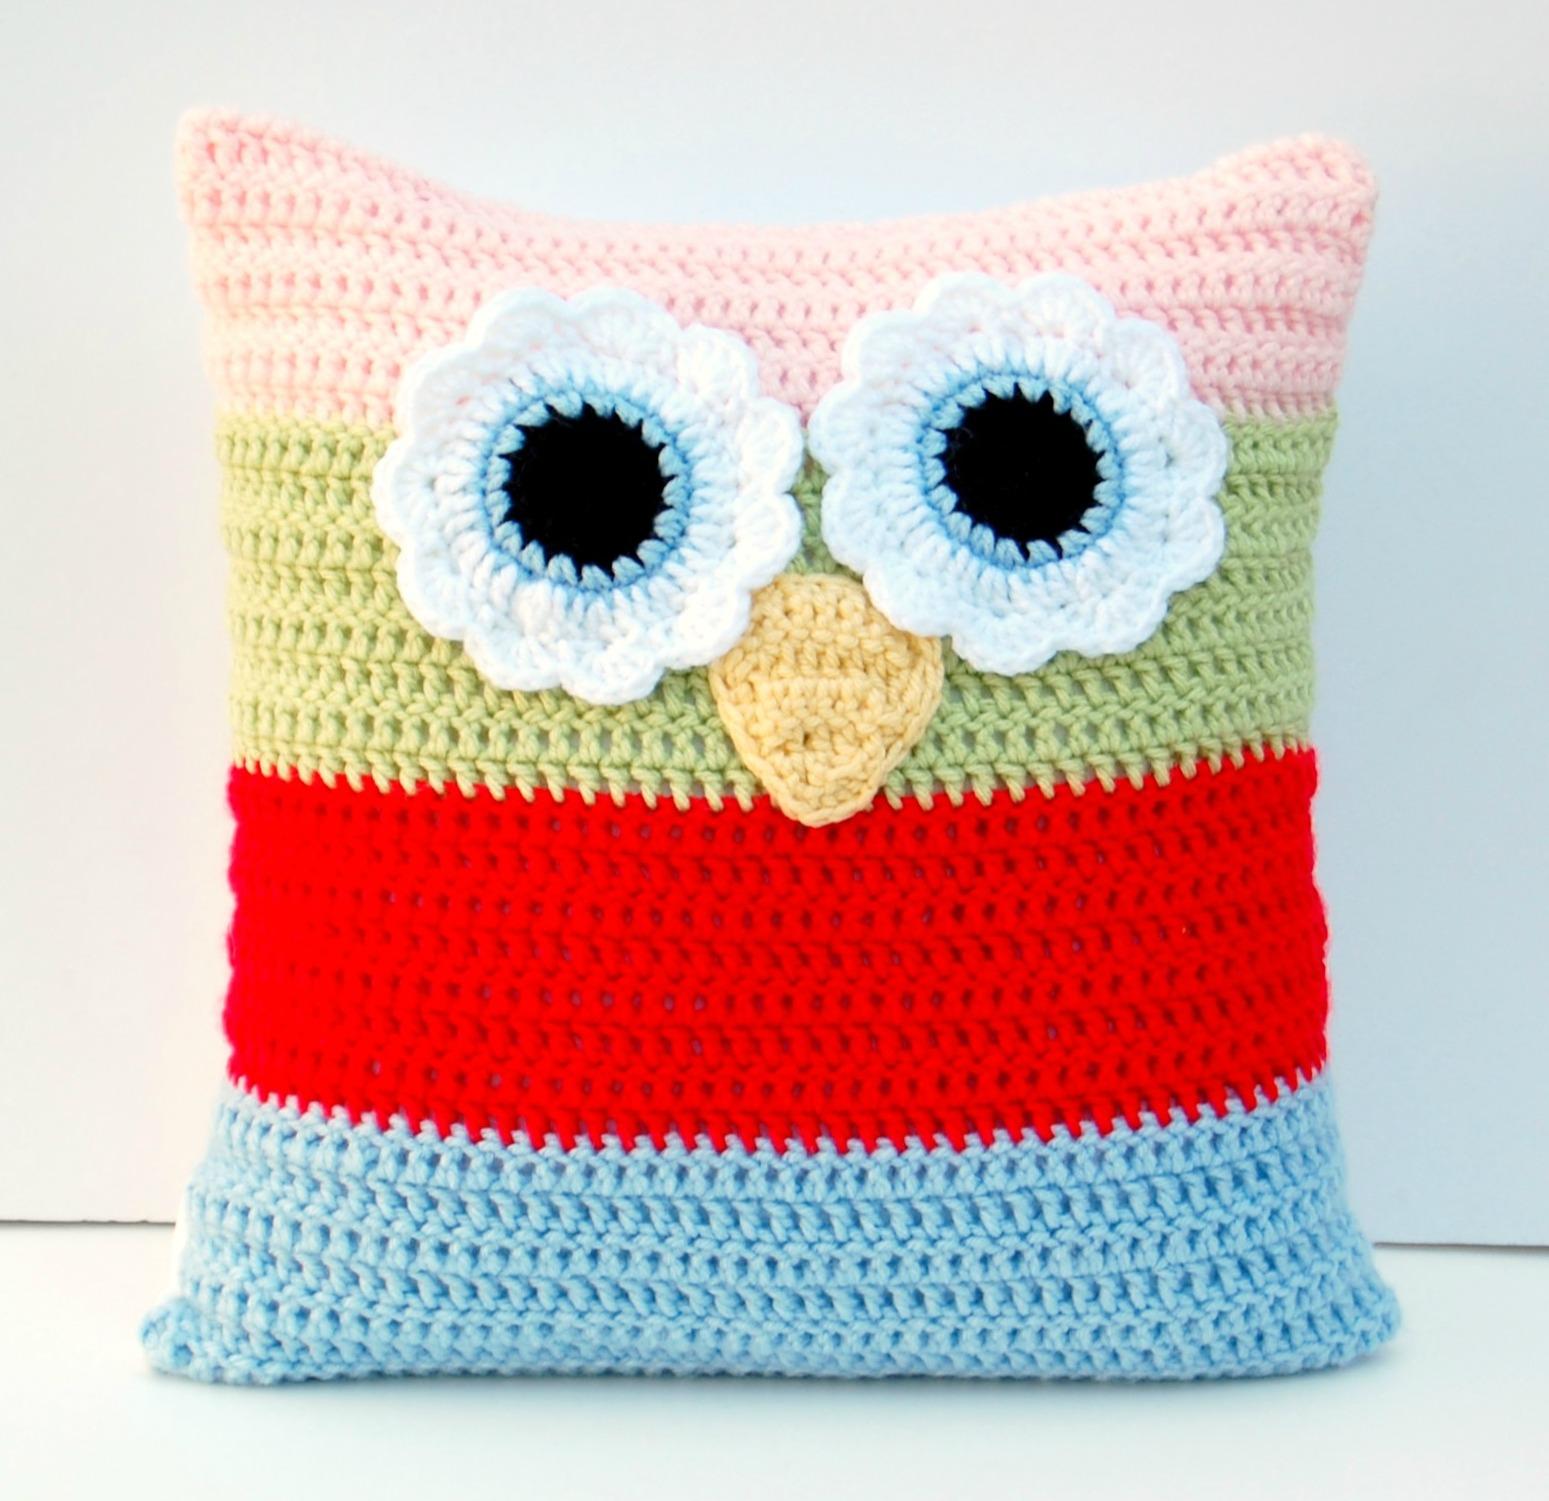 How To Make Cute Owl Pillows : hopscotch lane: Matching Crochet Blanket and Owl Pillow